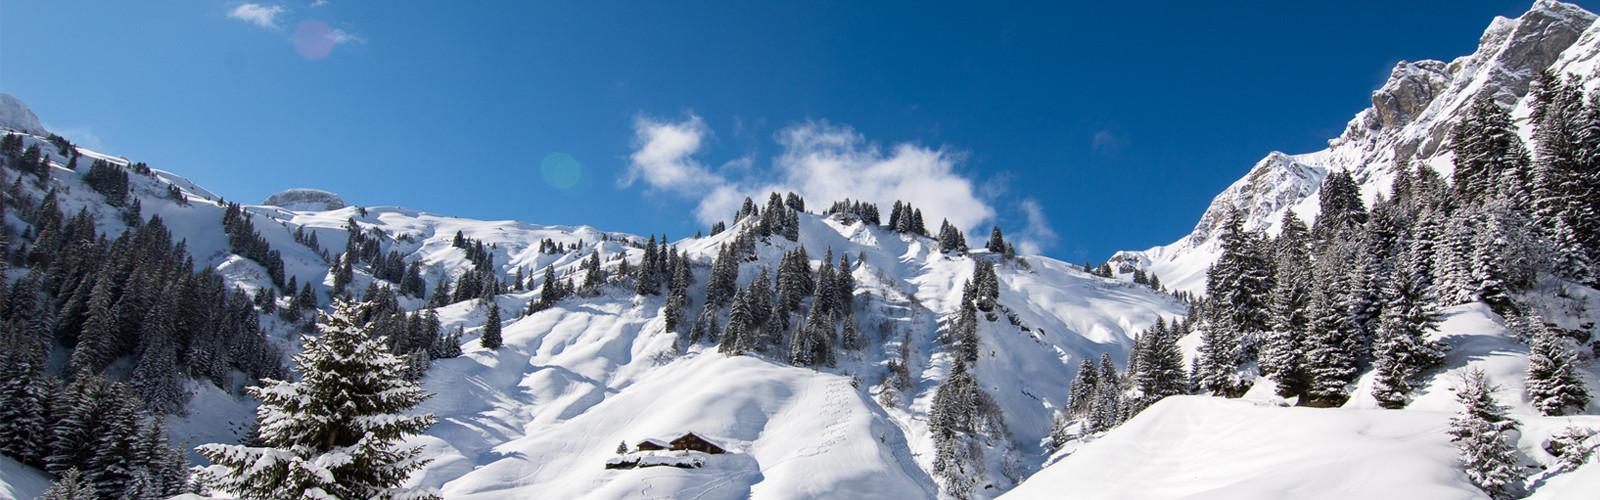 Avoriaz Ski Resort – Haute-Savoie